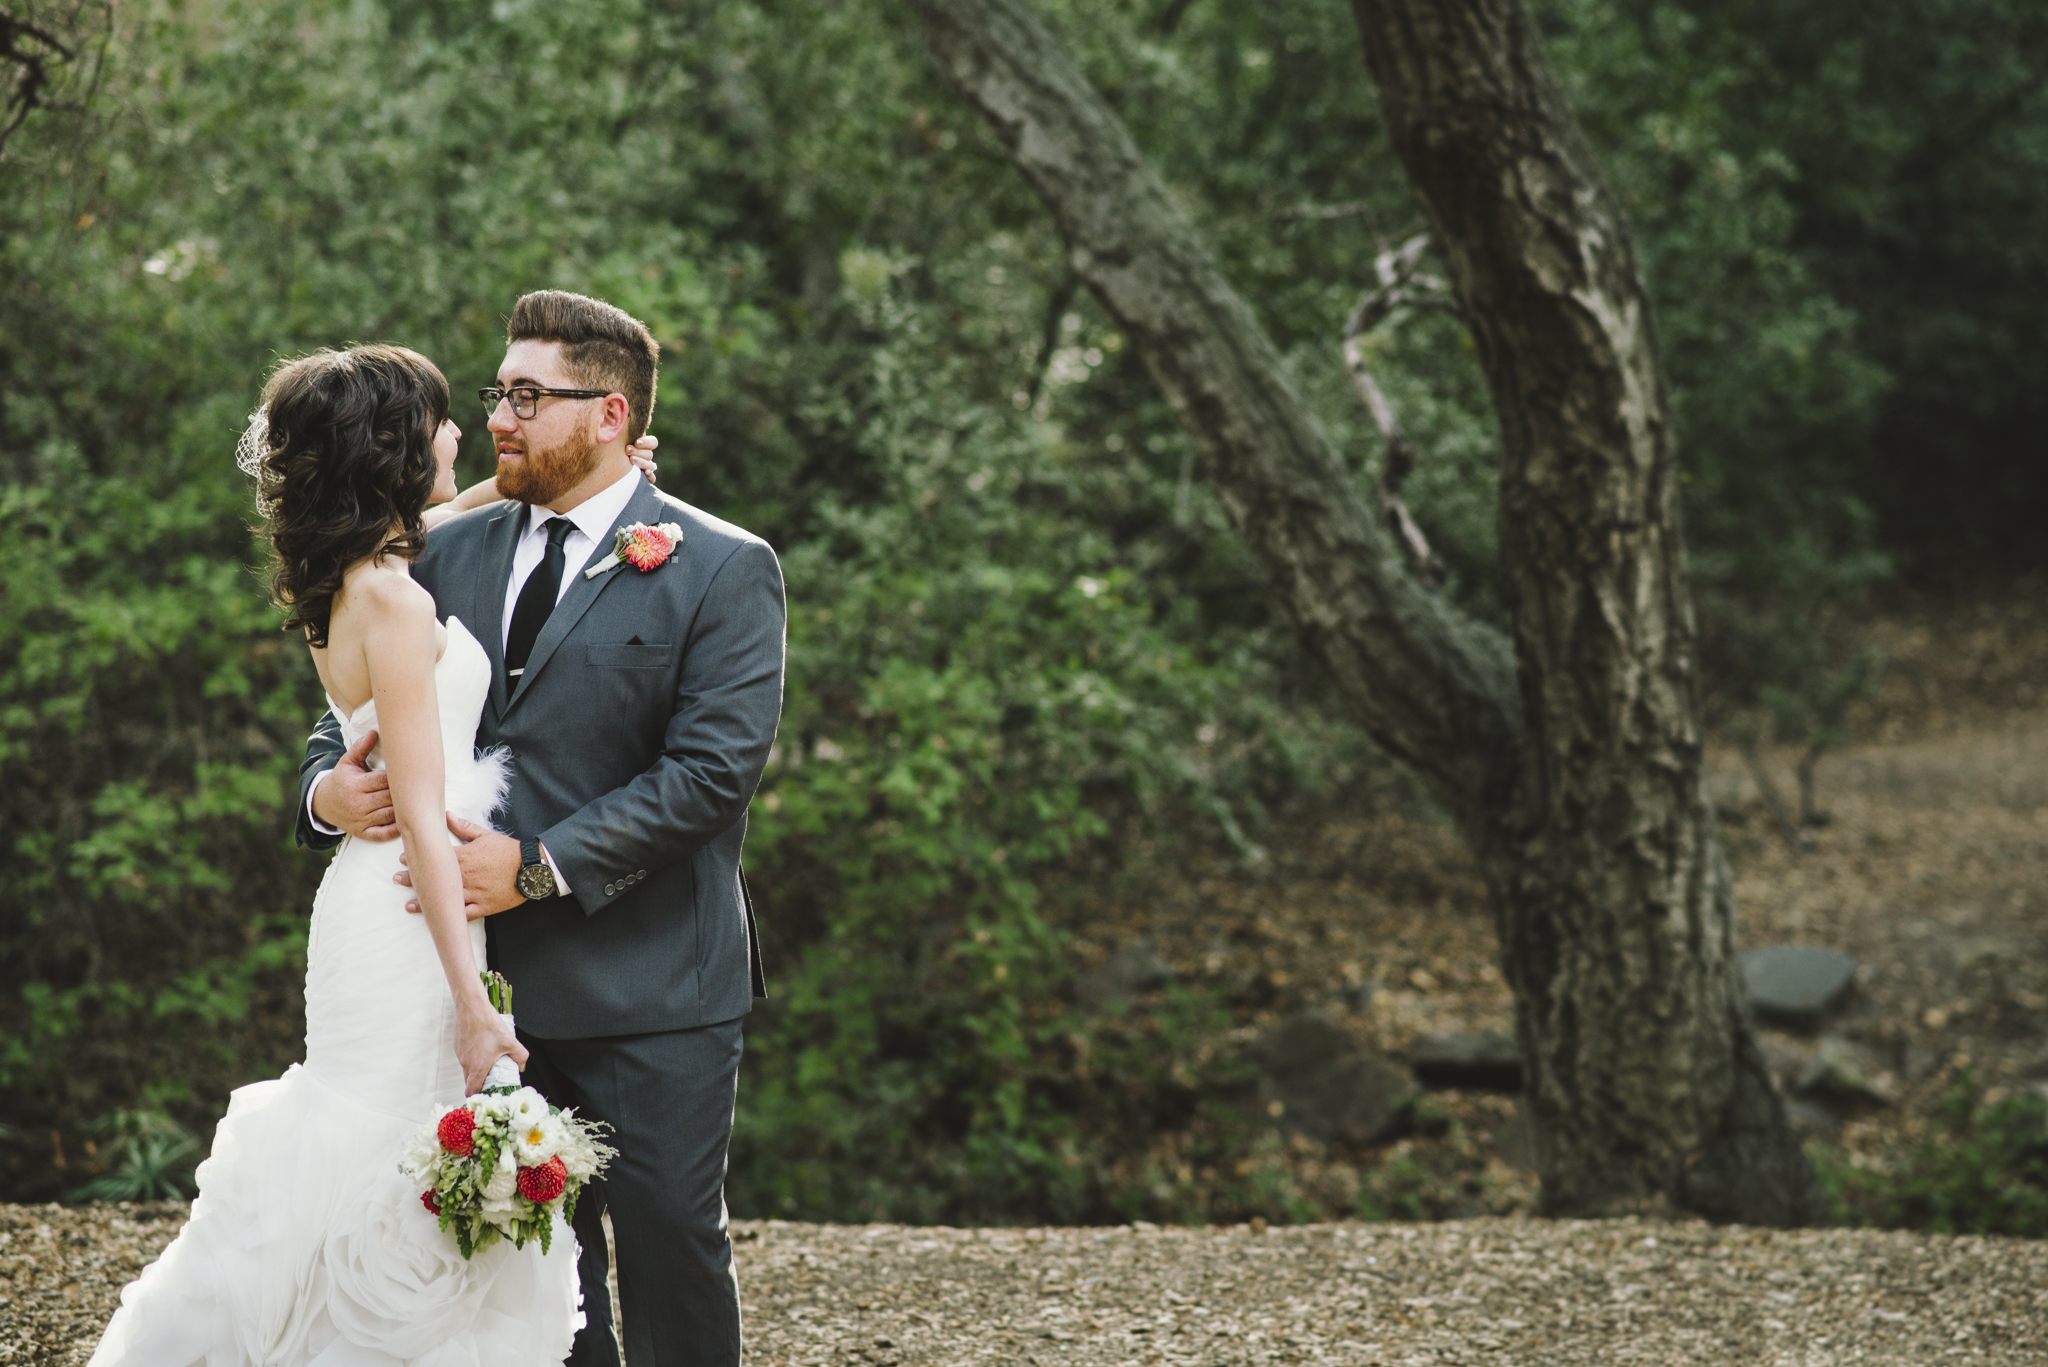 Isaiah & Taylor Photography - Los Angeles Lifestyle Wedding Photographer-16.jpg